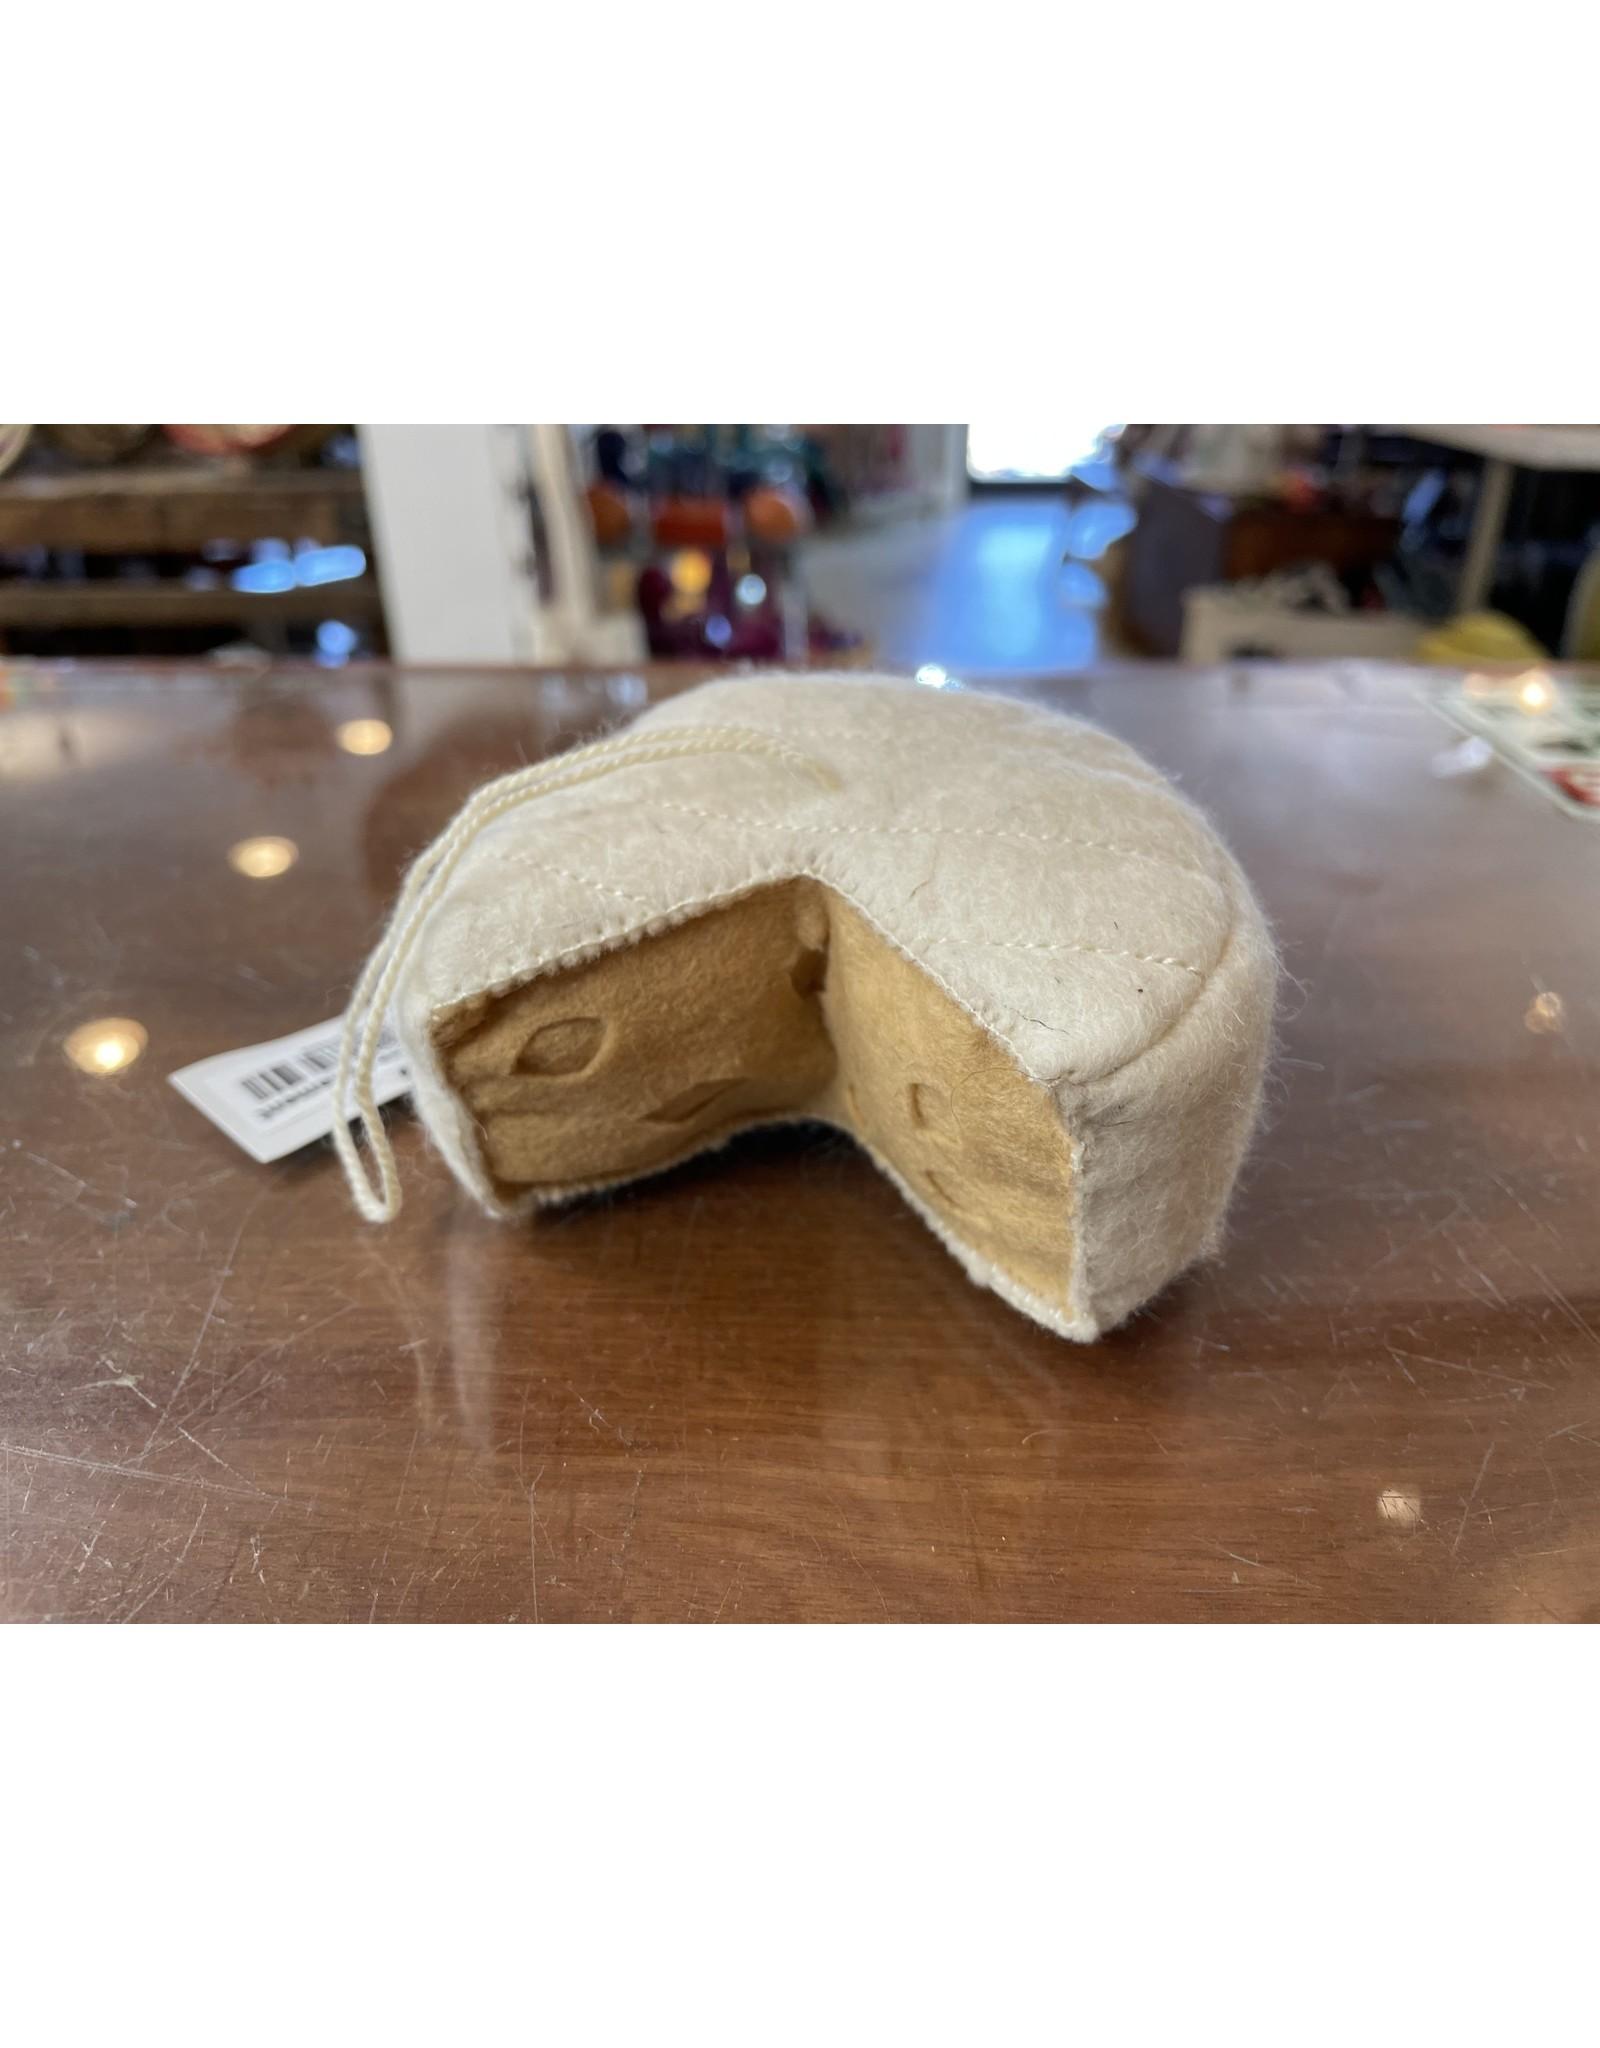 Felt Ornament Brie Cheese, Kyrgyzstan